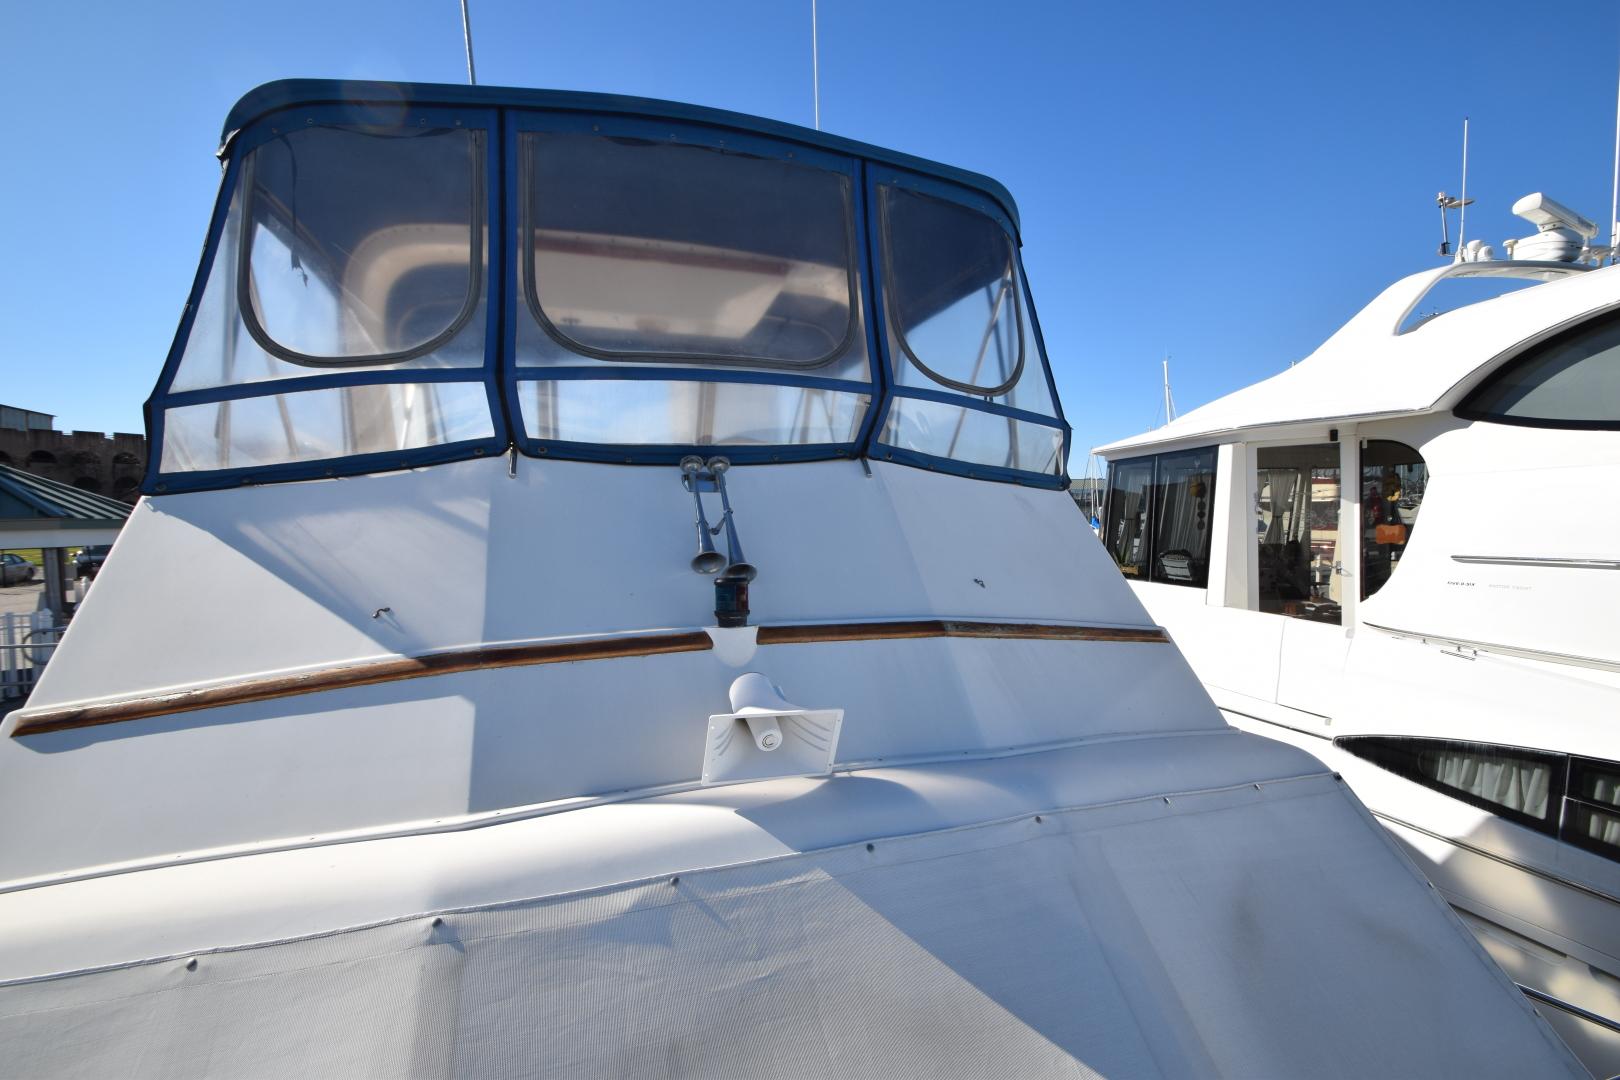 Ocean Yachts-46 Sunliner 1986-Sugah Portsmouth-Virginia-United States-1555545 | Thumbnail